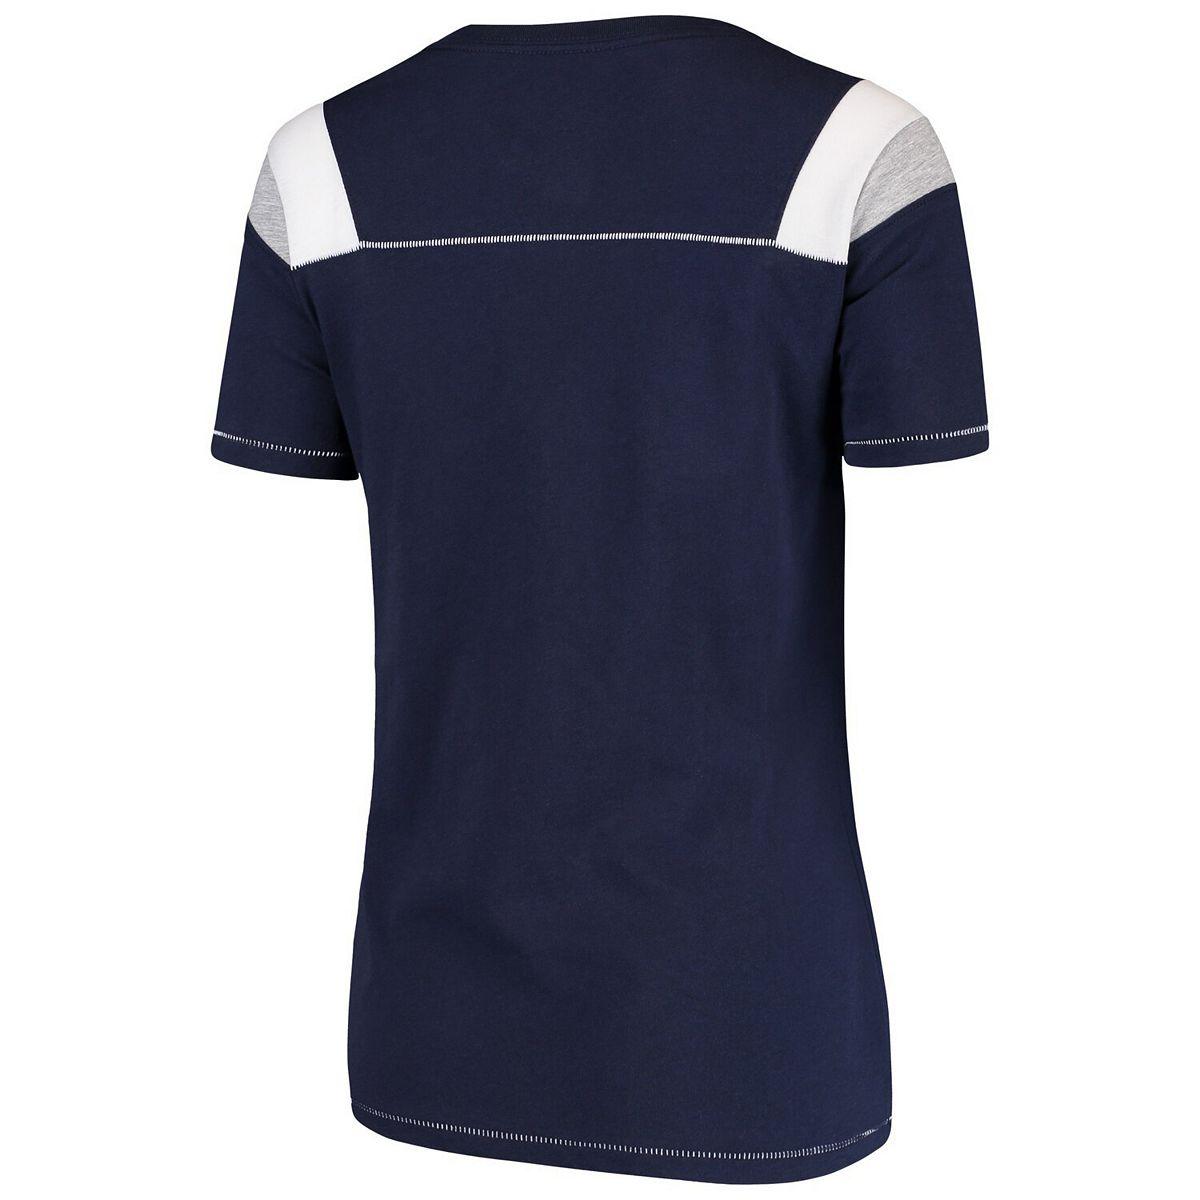 Women's Navy Dallas Cowboys Flapper Scoop Neck T-Shirt d7JSg